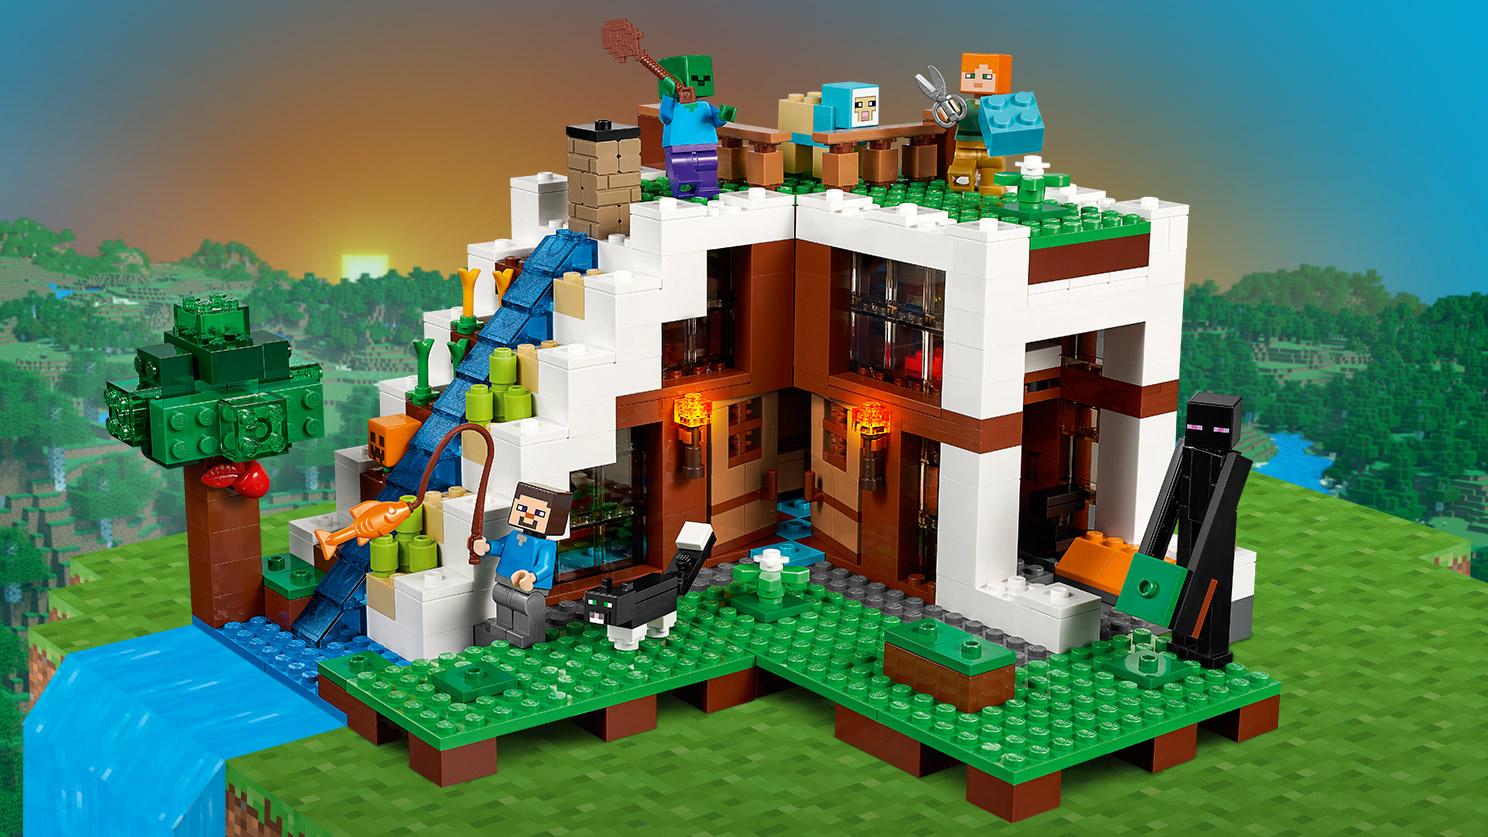 Fall Waterfall Wallpaper Minecraft Derni 232 Res News Lego Minecraft 6 Nouvelles